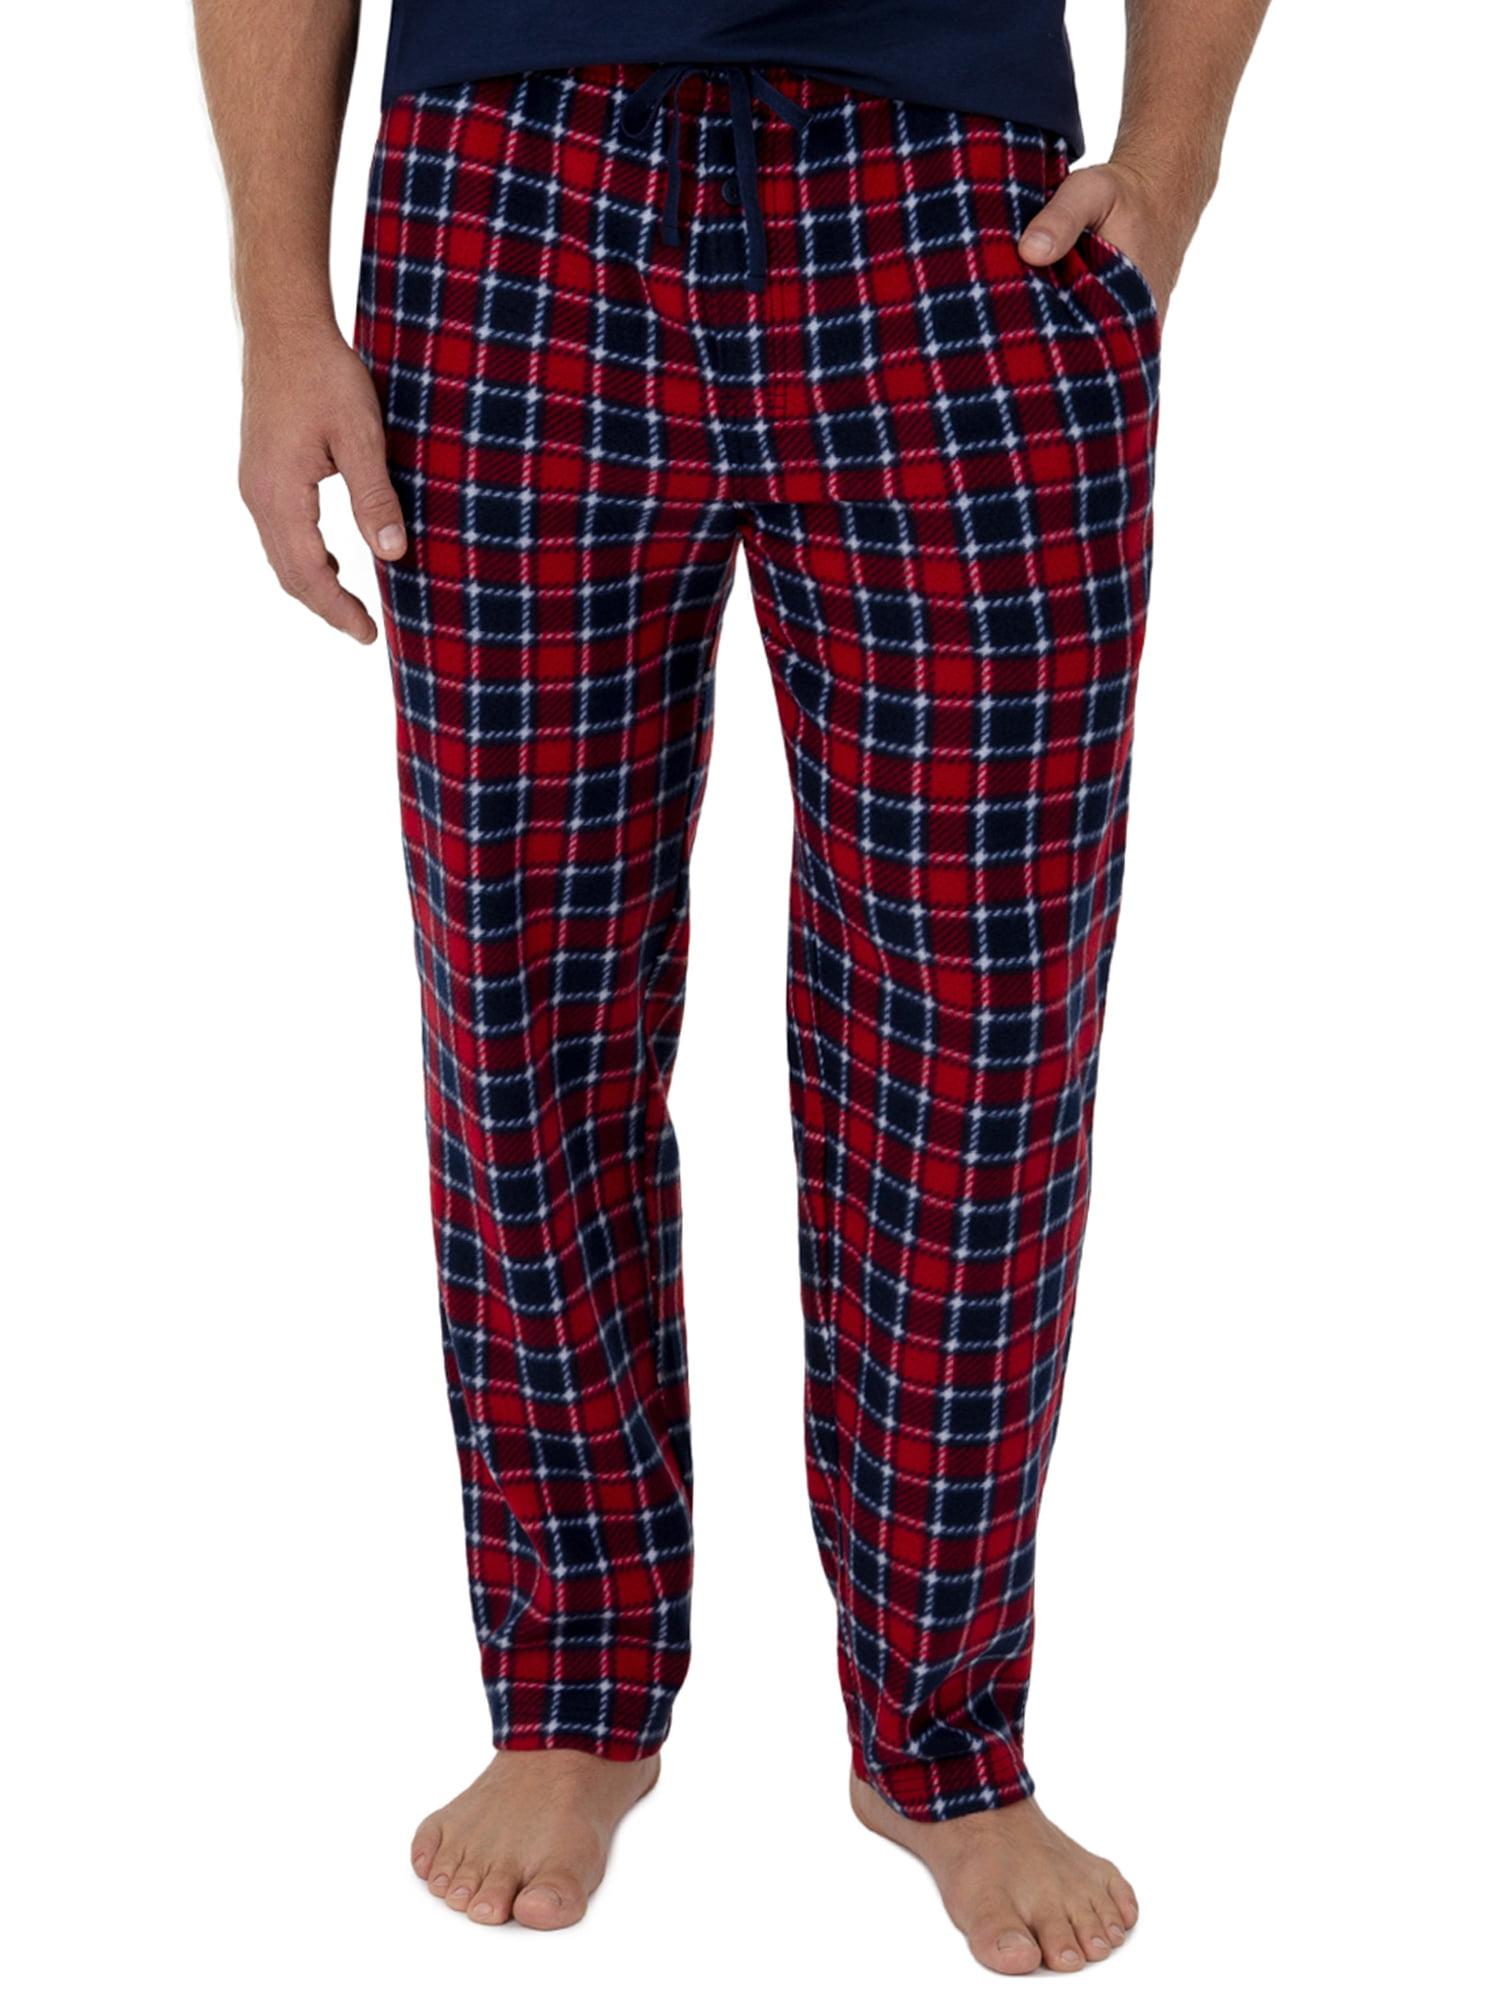 Fruit of the Loom Men's Fleece Pajama Pant